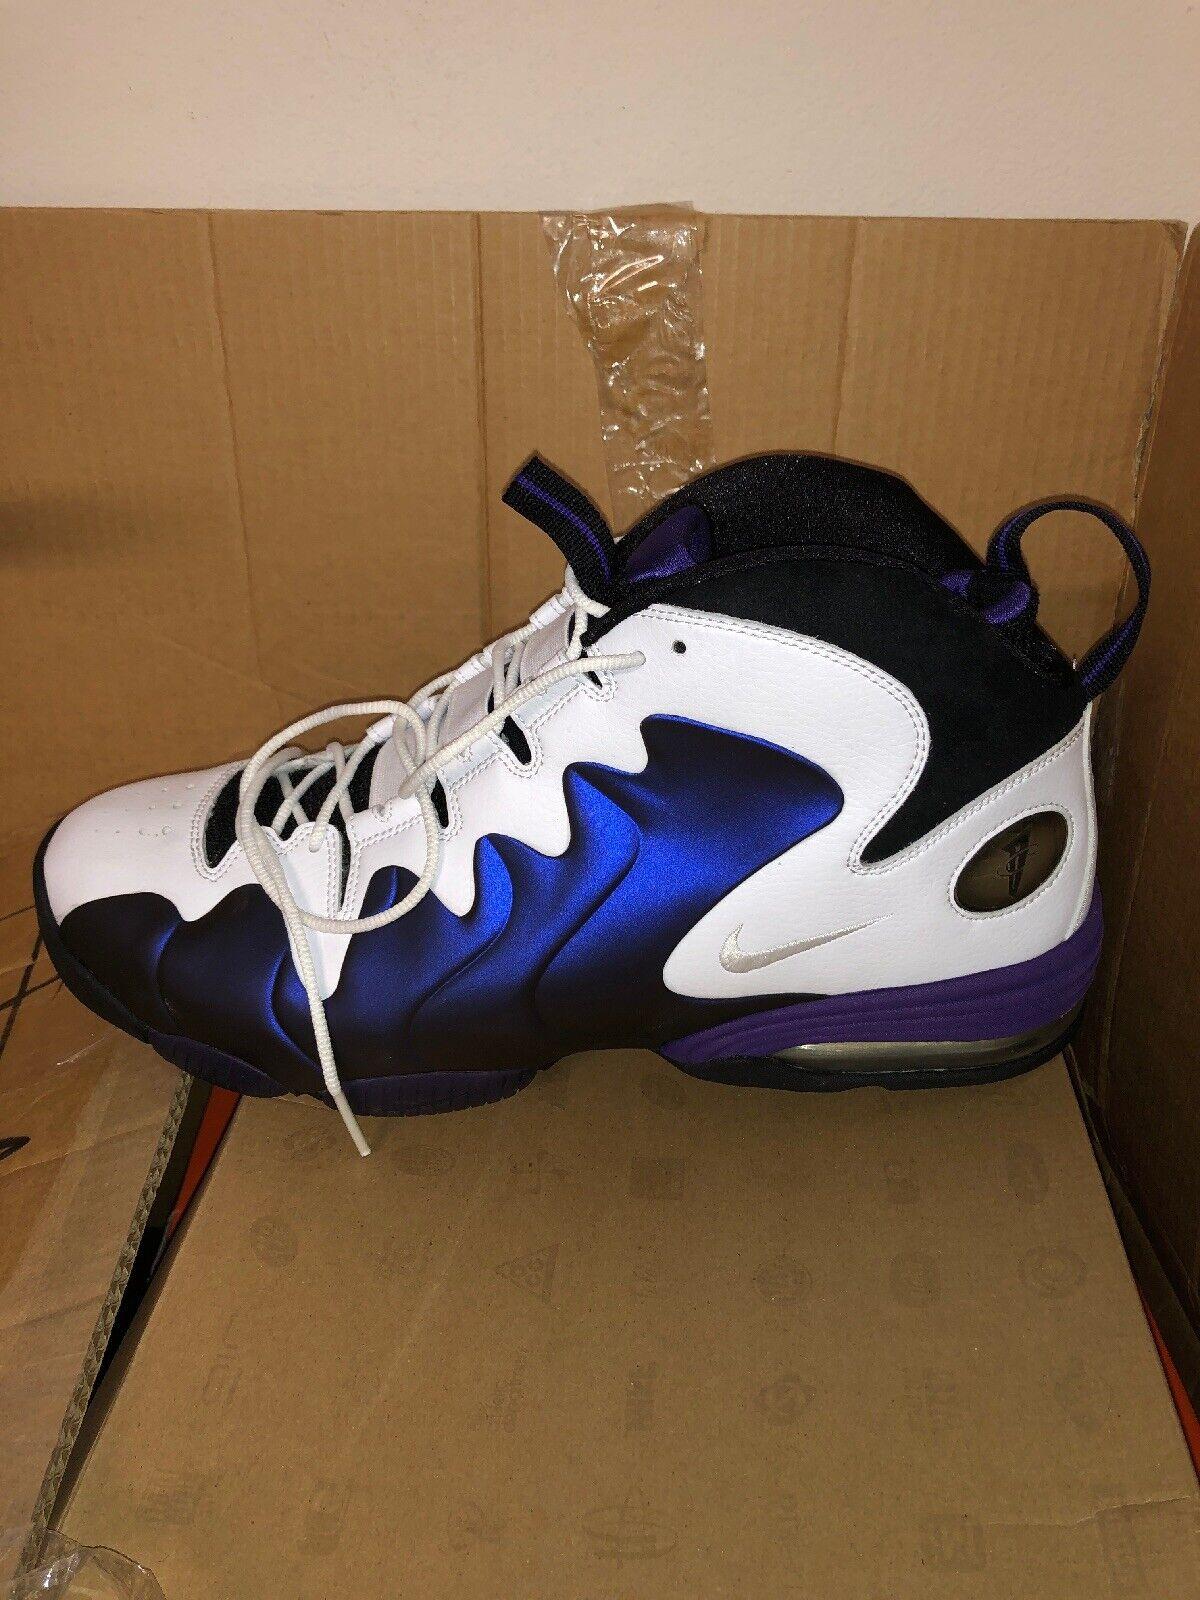 858661056206 Nike Air Pennt III 3 White Eggplant Foam Hardaway Hardaway Hardaway Size 14  b18766